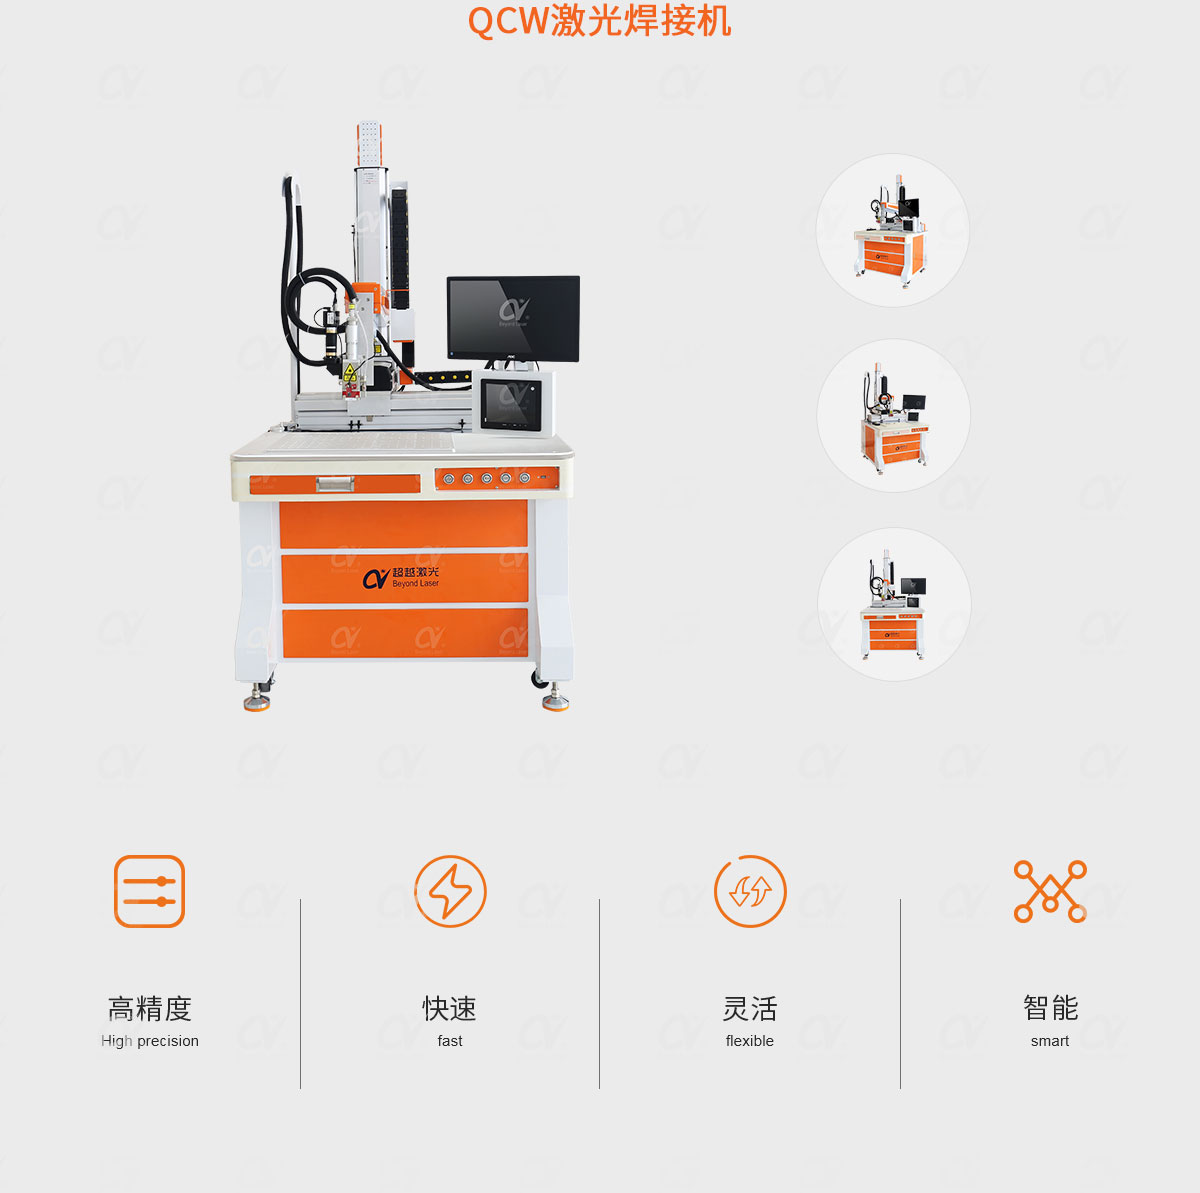 QCW激光焊接机雨燕直播体育网站简介.jpg